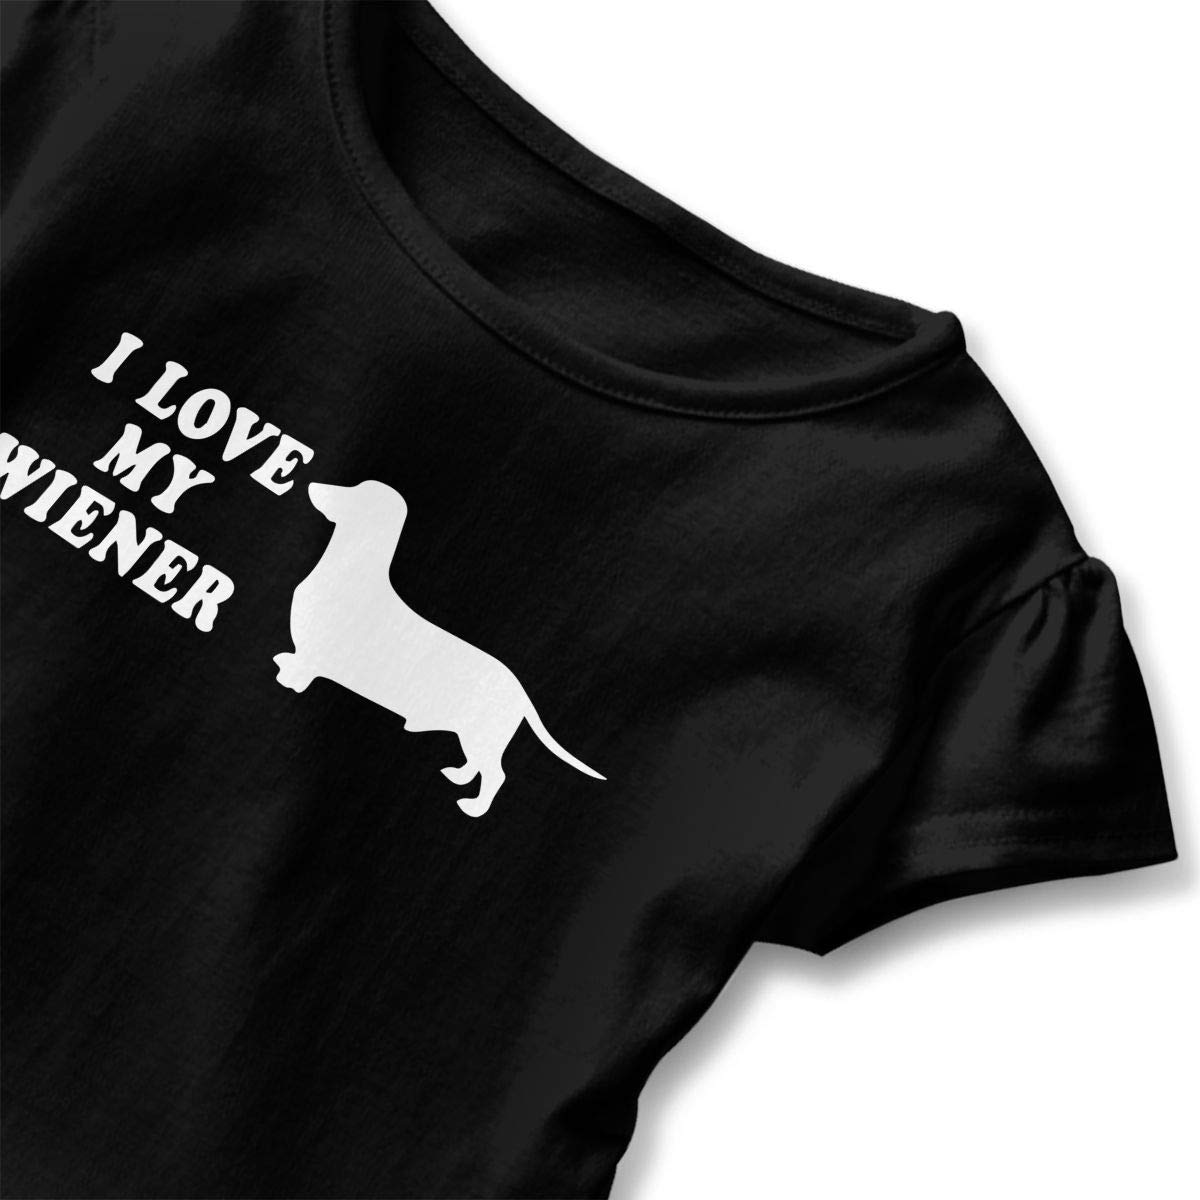 I Love My Wiener with Dachshund Shirts Kids Girls Short Sleeve Ruffles Shirt T-Shirt for 2-6T